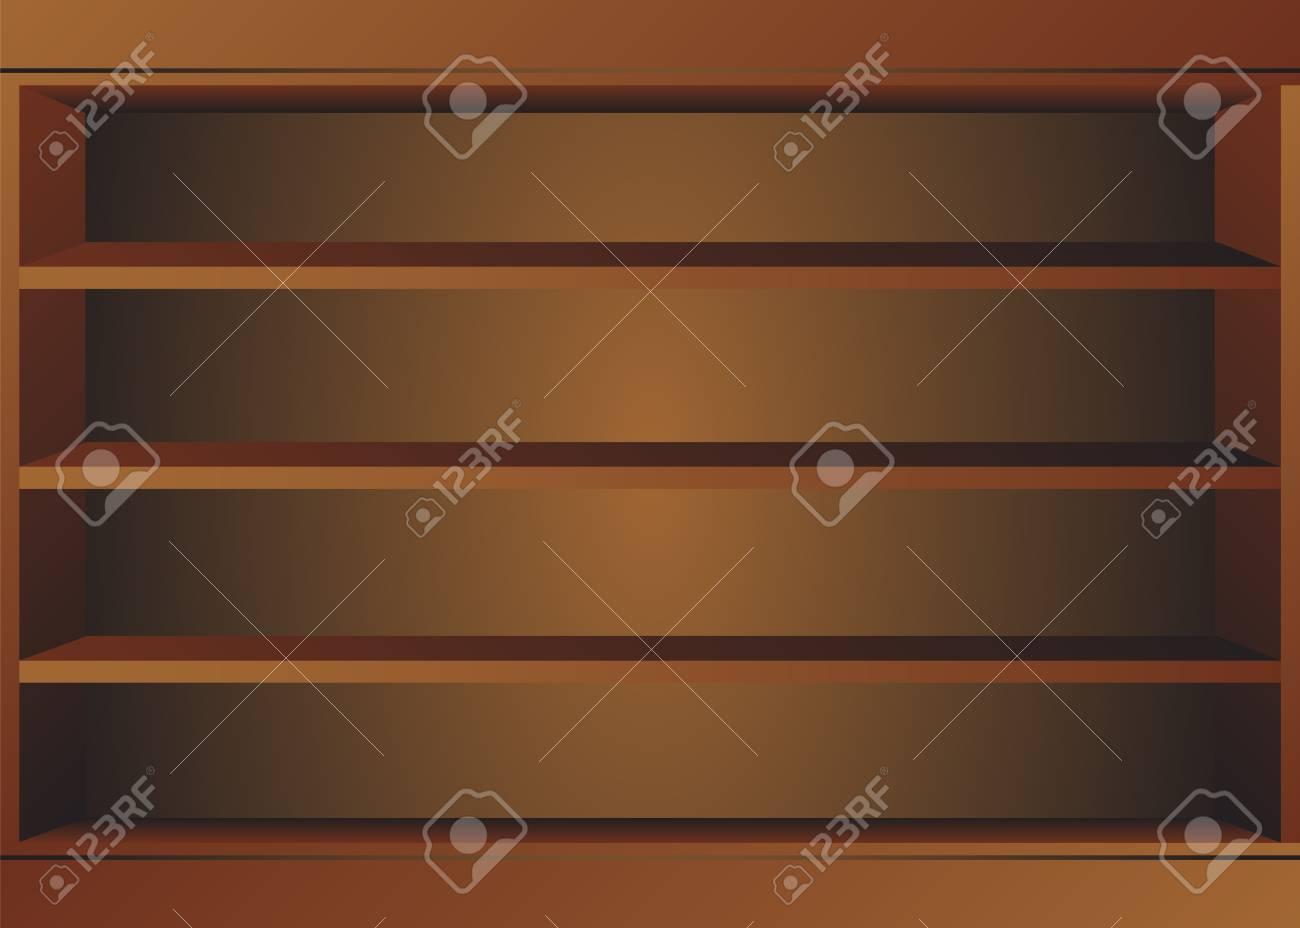 Wooden Book Shelf Shop Shelves Isolated Store Shelves Retail